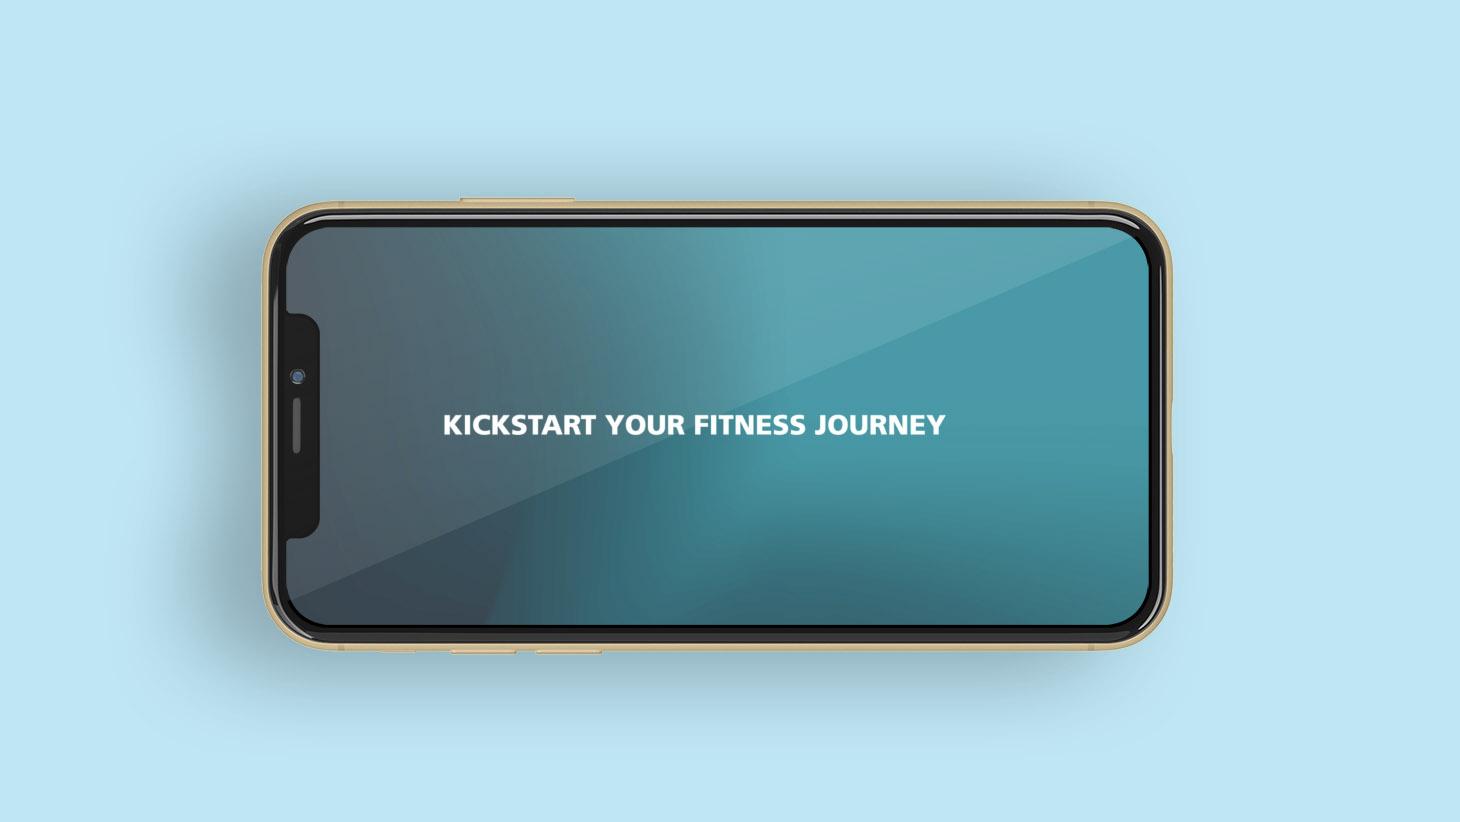 Kickstart your fitness journey message on iPhone screen